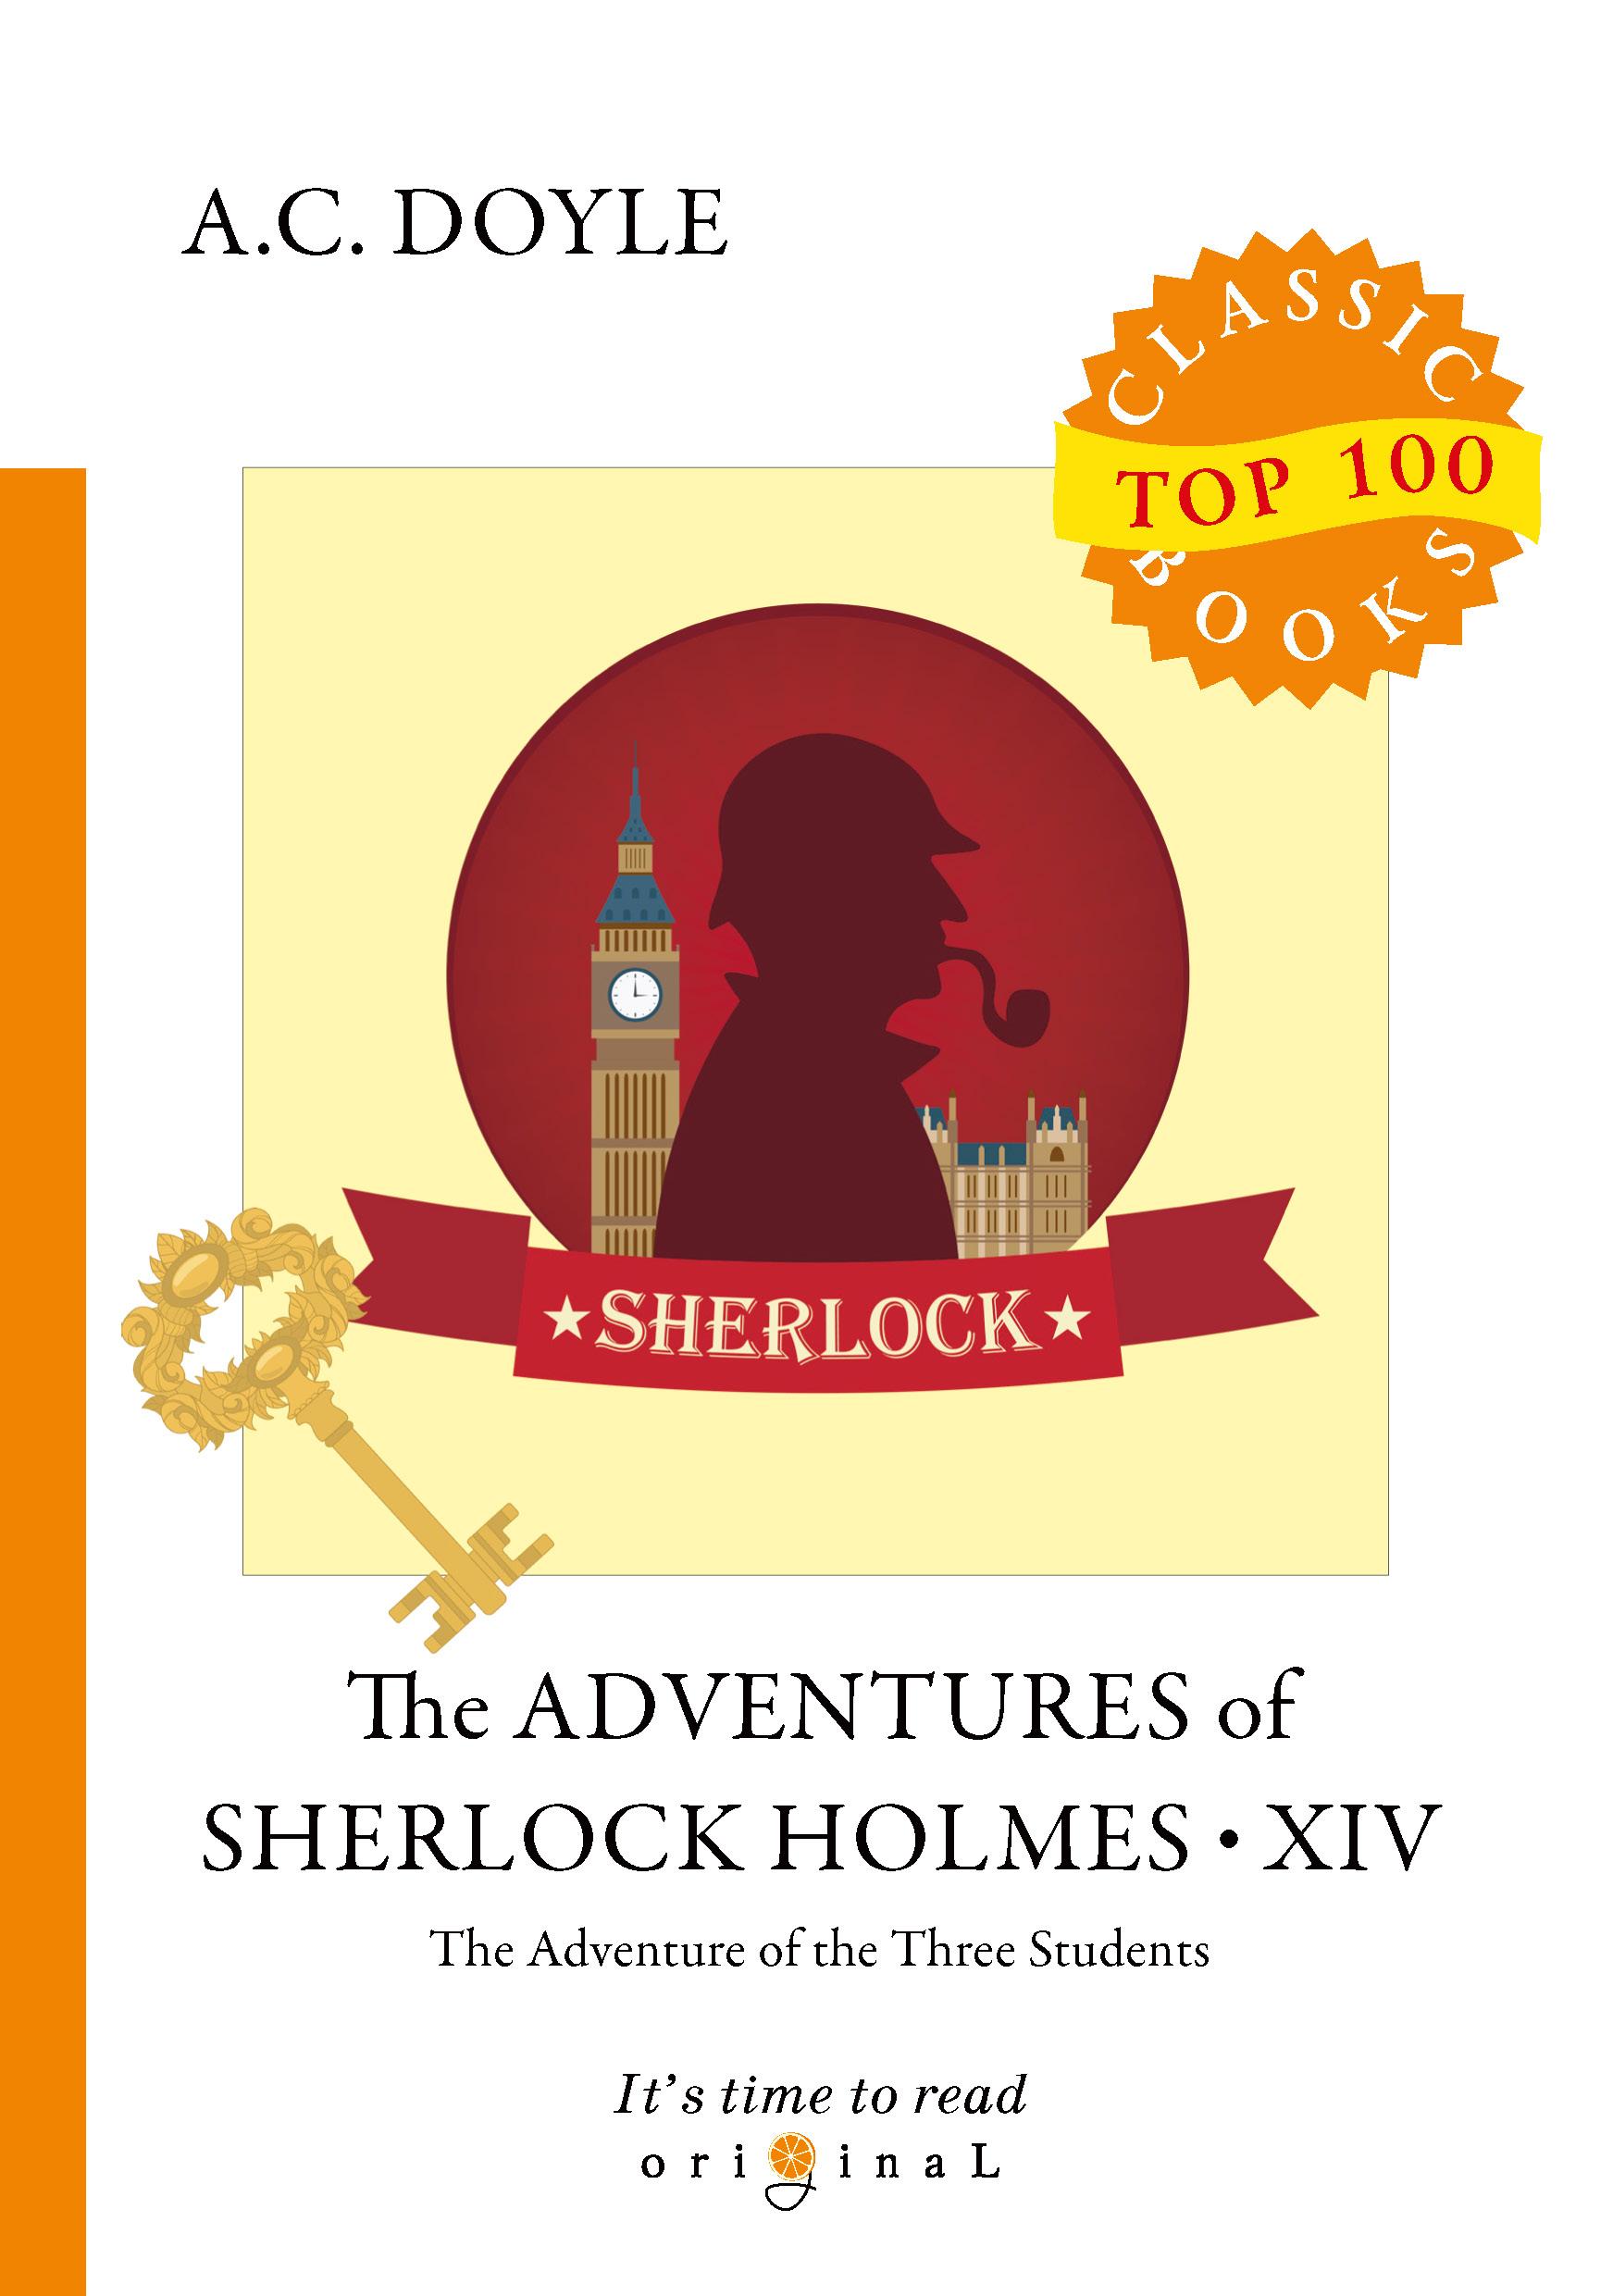 A. C. Doyle The Adventures of Sherlock Holmes XIV